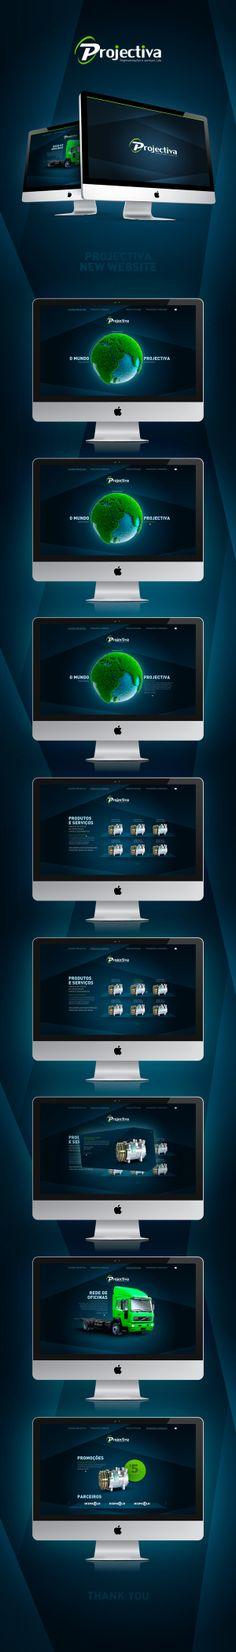 Projectiva #Website by João Alberto, via #Behance